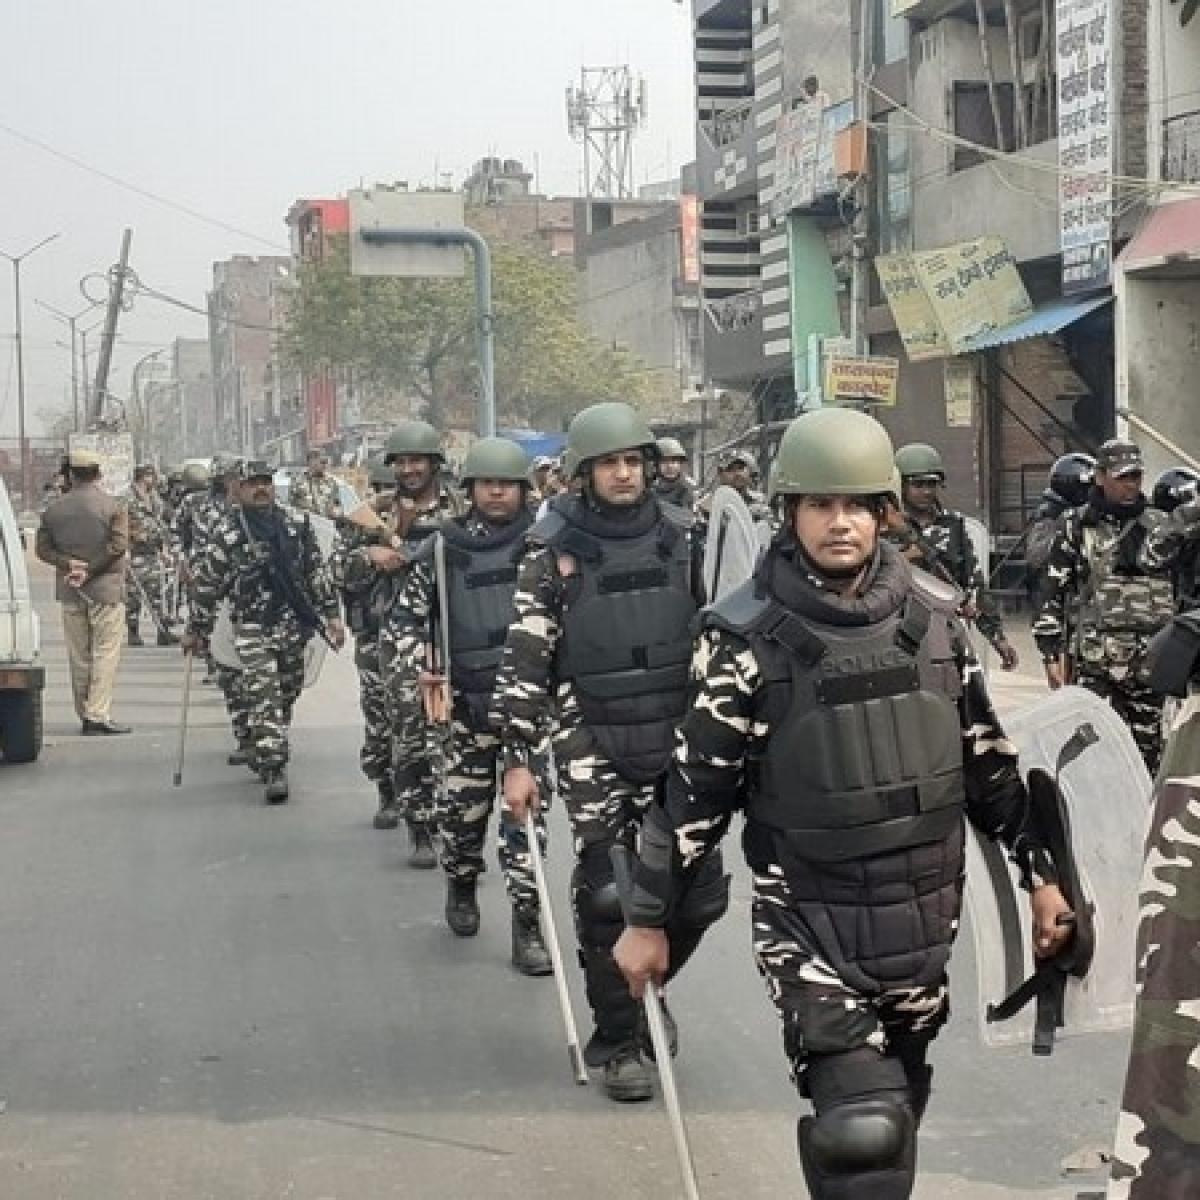 'It is heartbreaking': Indian cricket fraternity condemn Delhi violence